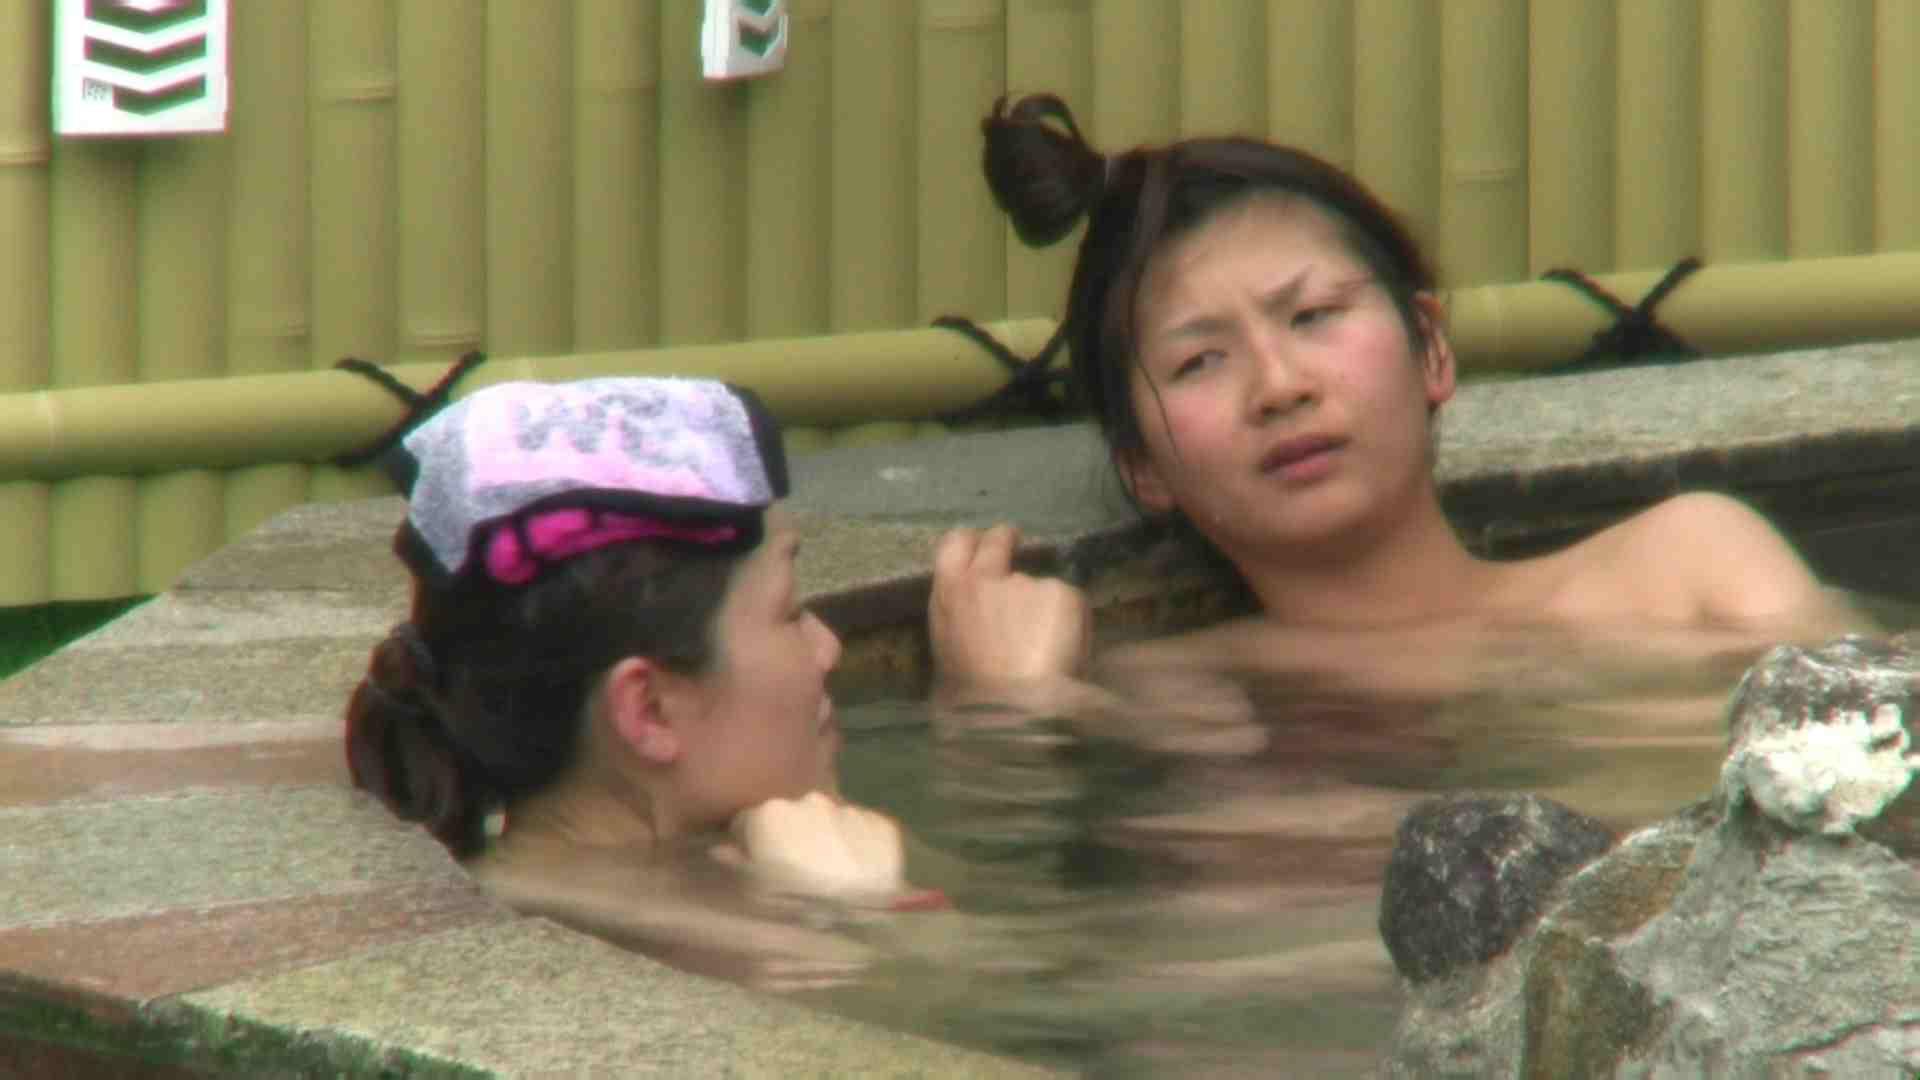 Aquaな露天風呂Vol.66【VIP限定】 OLエロ画像 覗きオメコ動画キャプチャ 74PICs 50